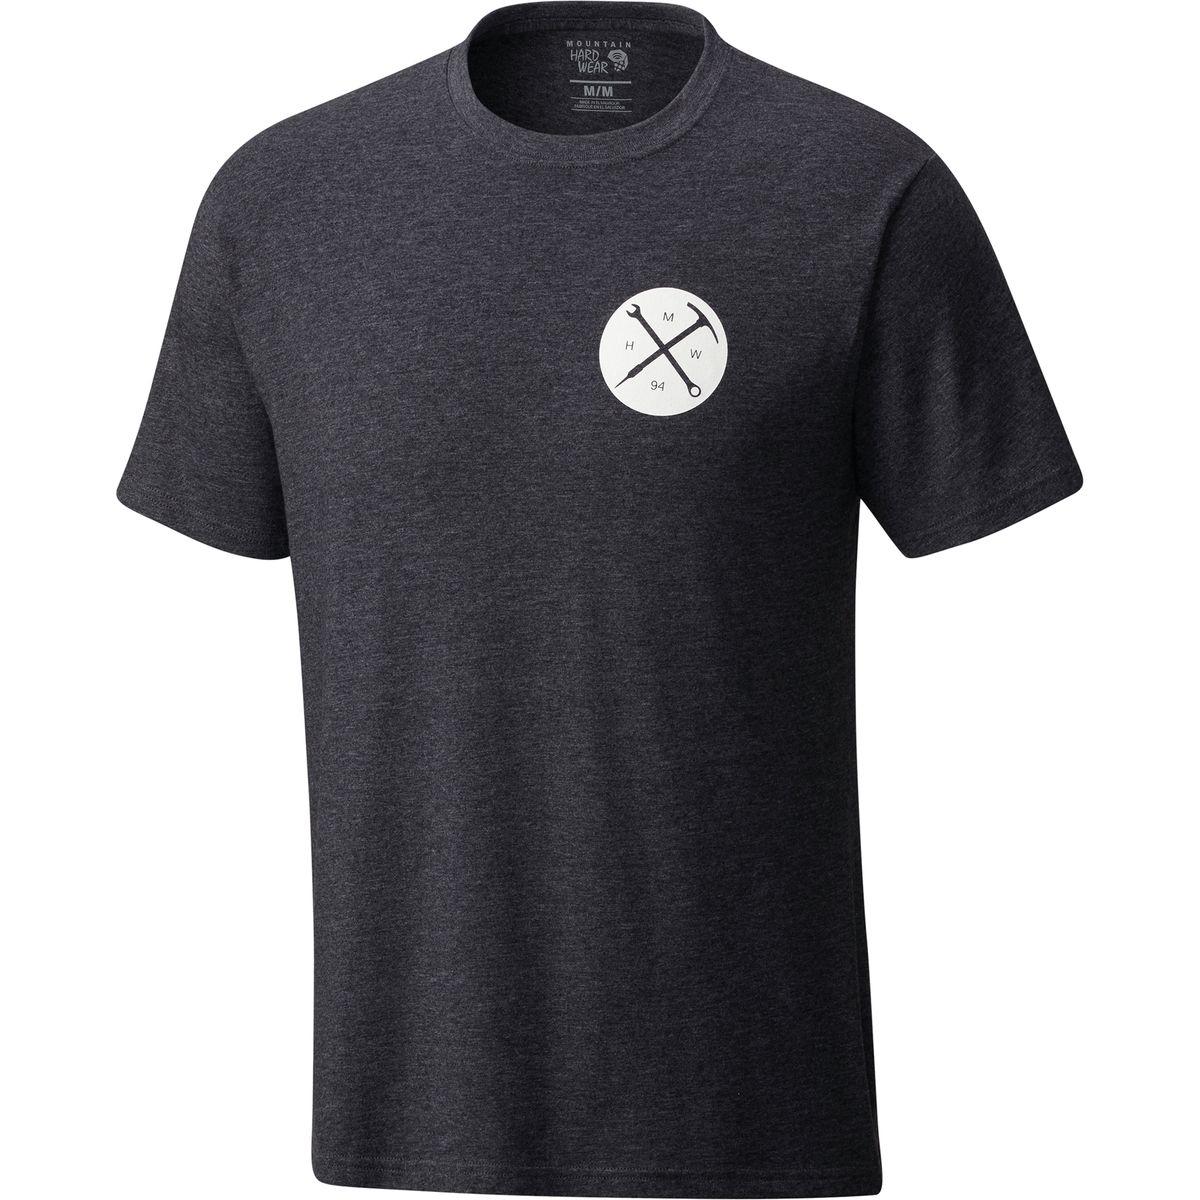 Mountain Hardwear MTN Mechanic Crest Short-Sleeve T-Shirt - Men